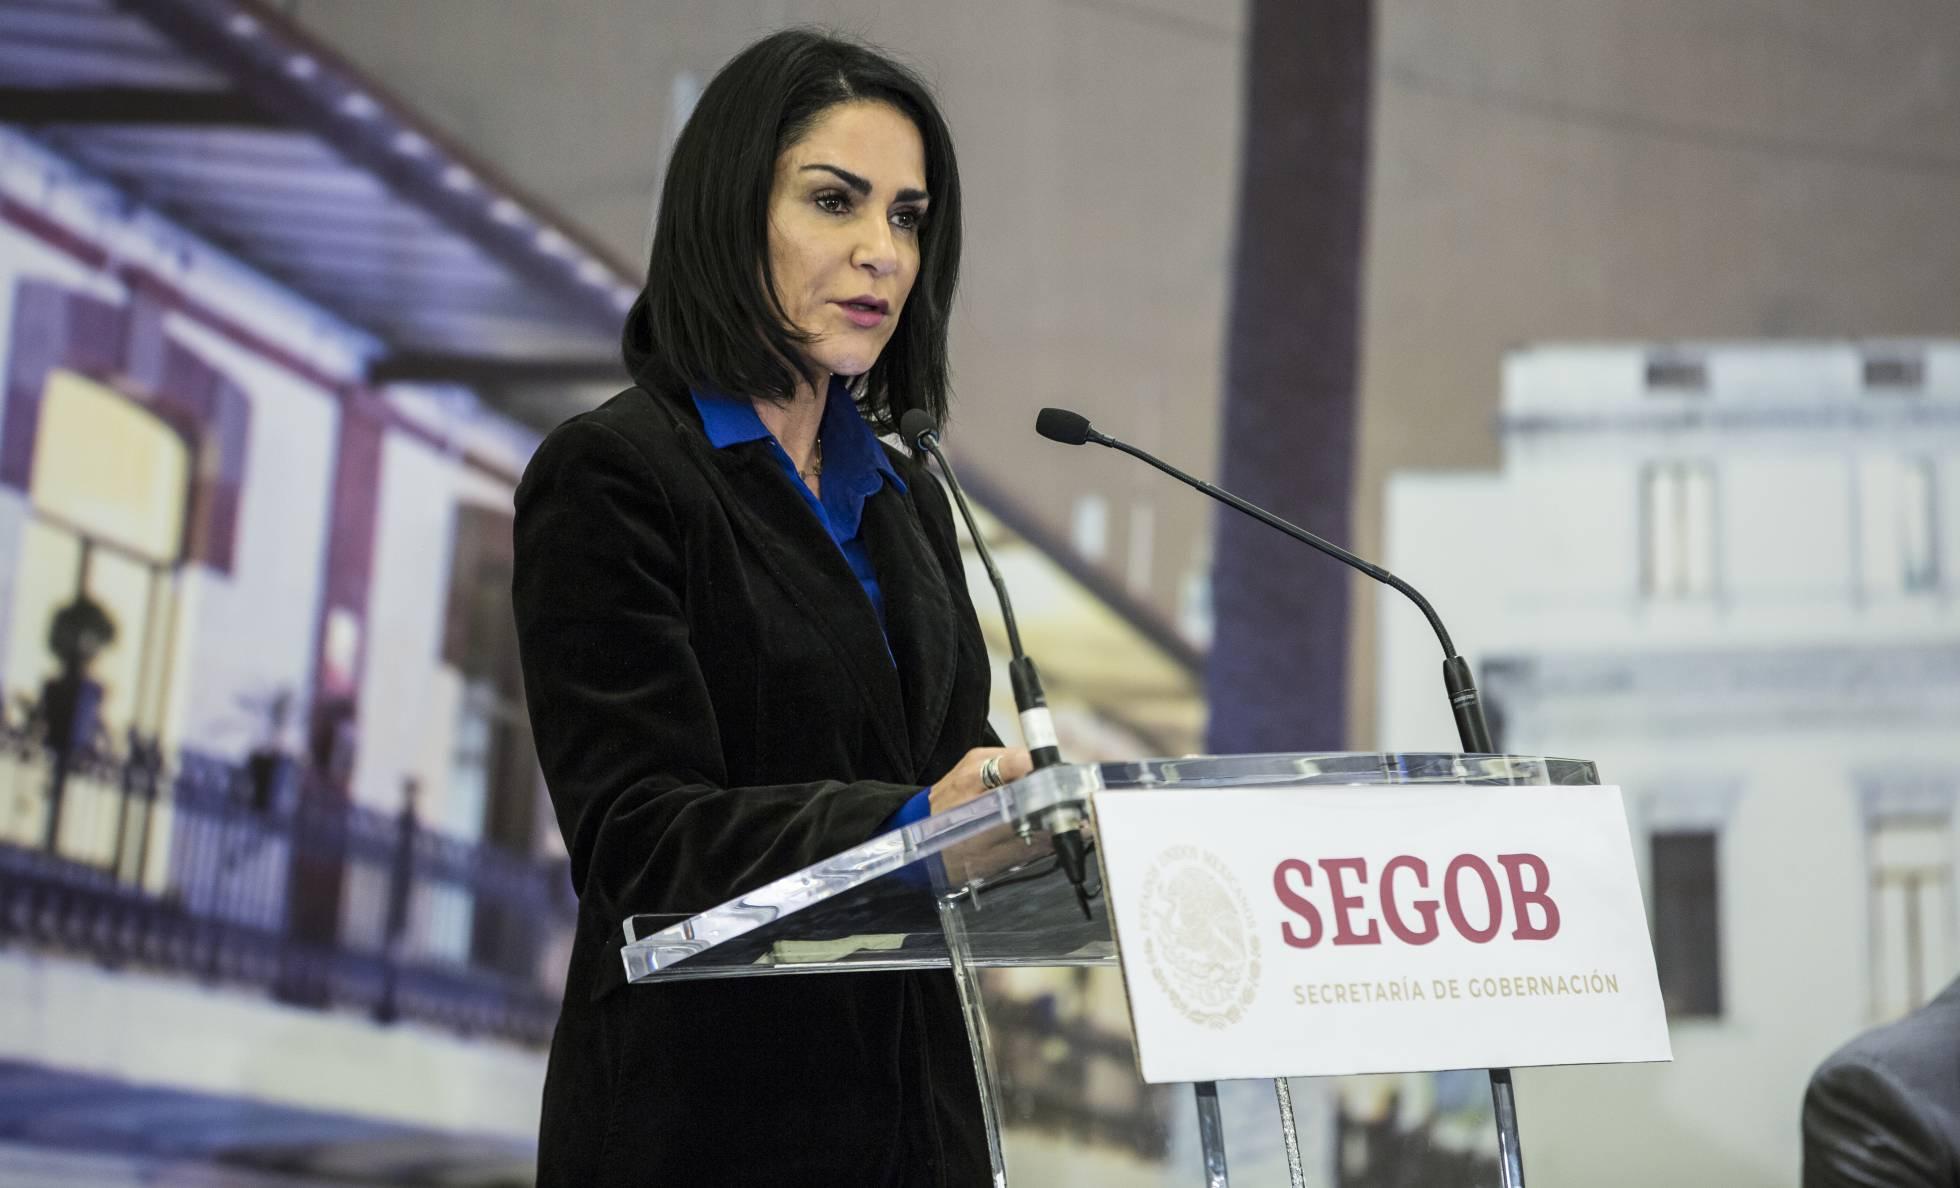 La reportera Lydia Cacho sufre un robo de información sobre casos de pederastia en México